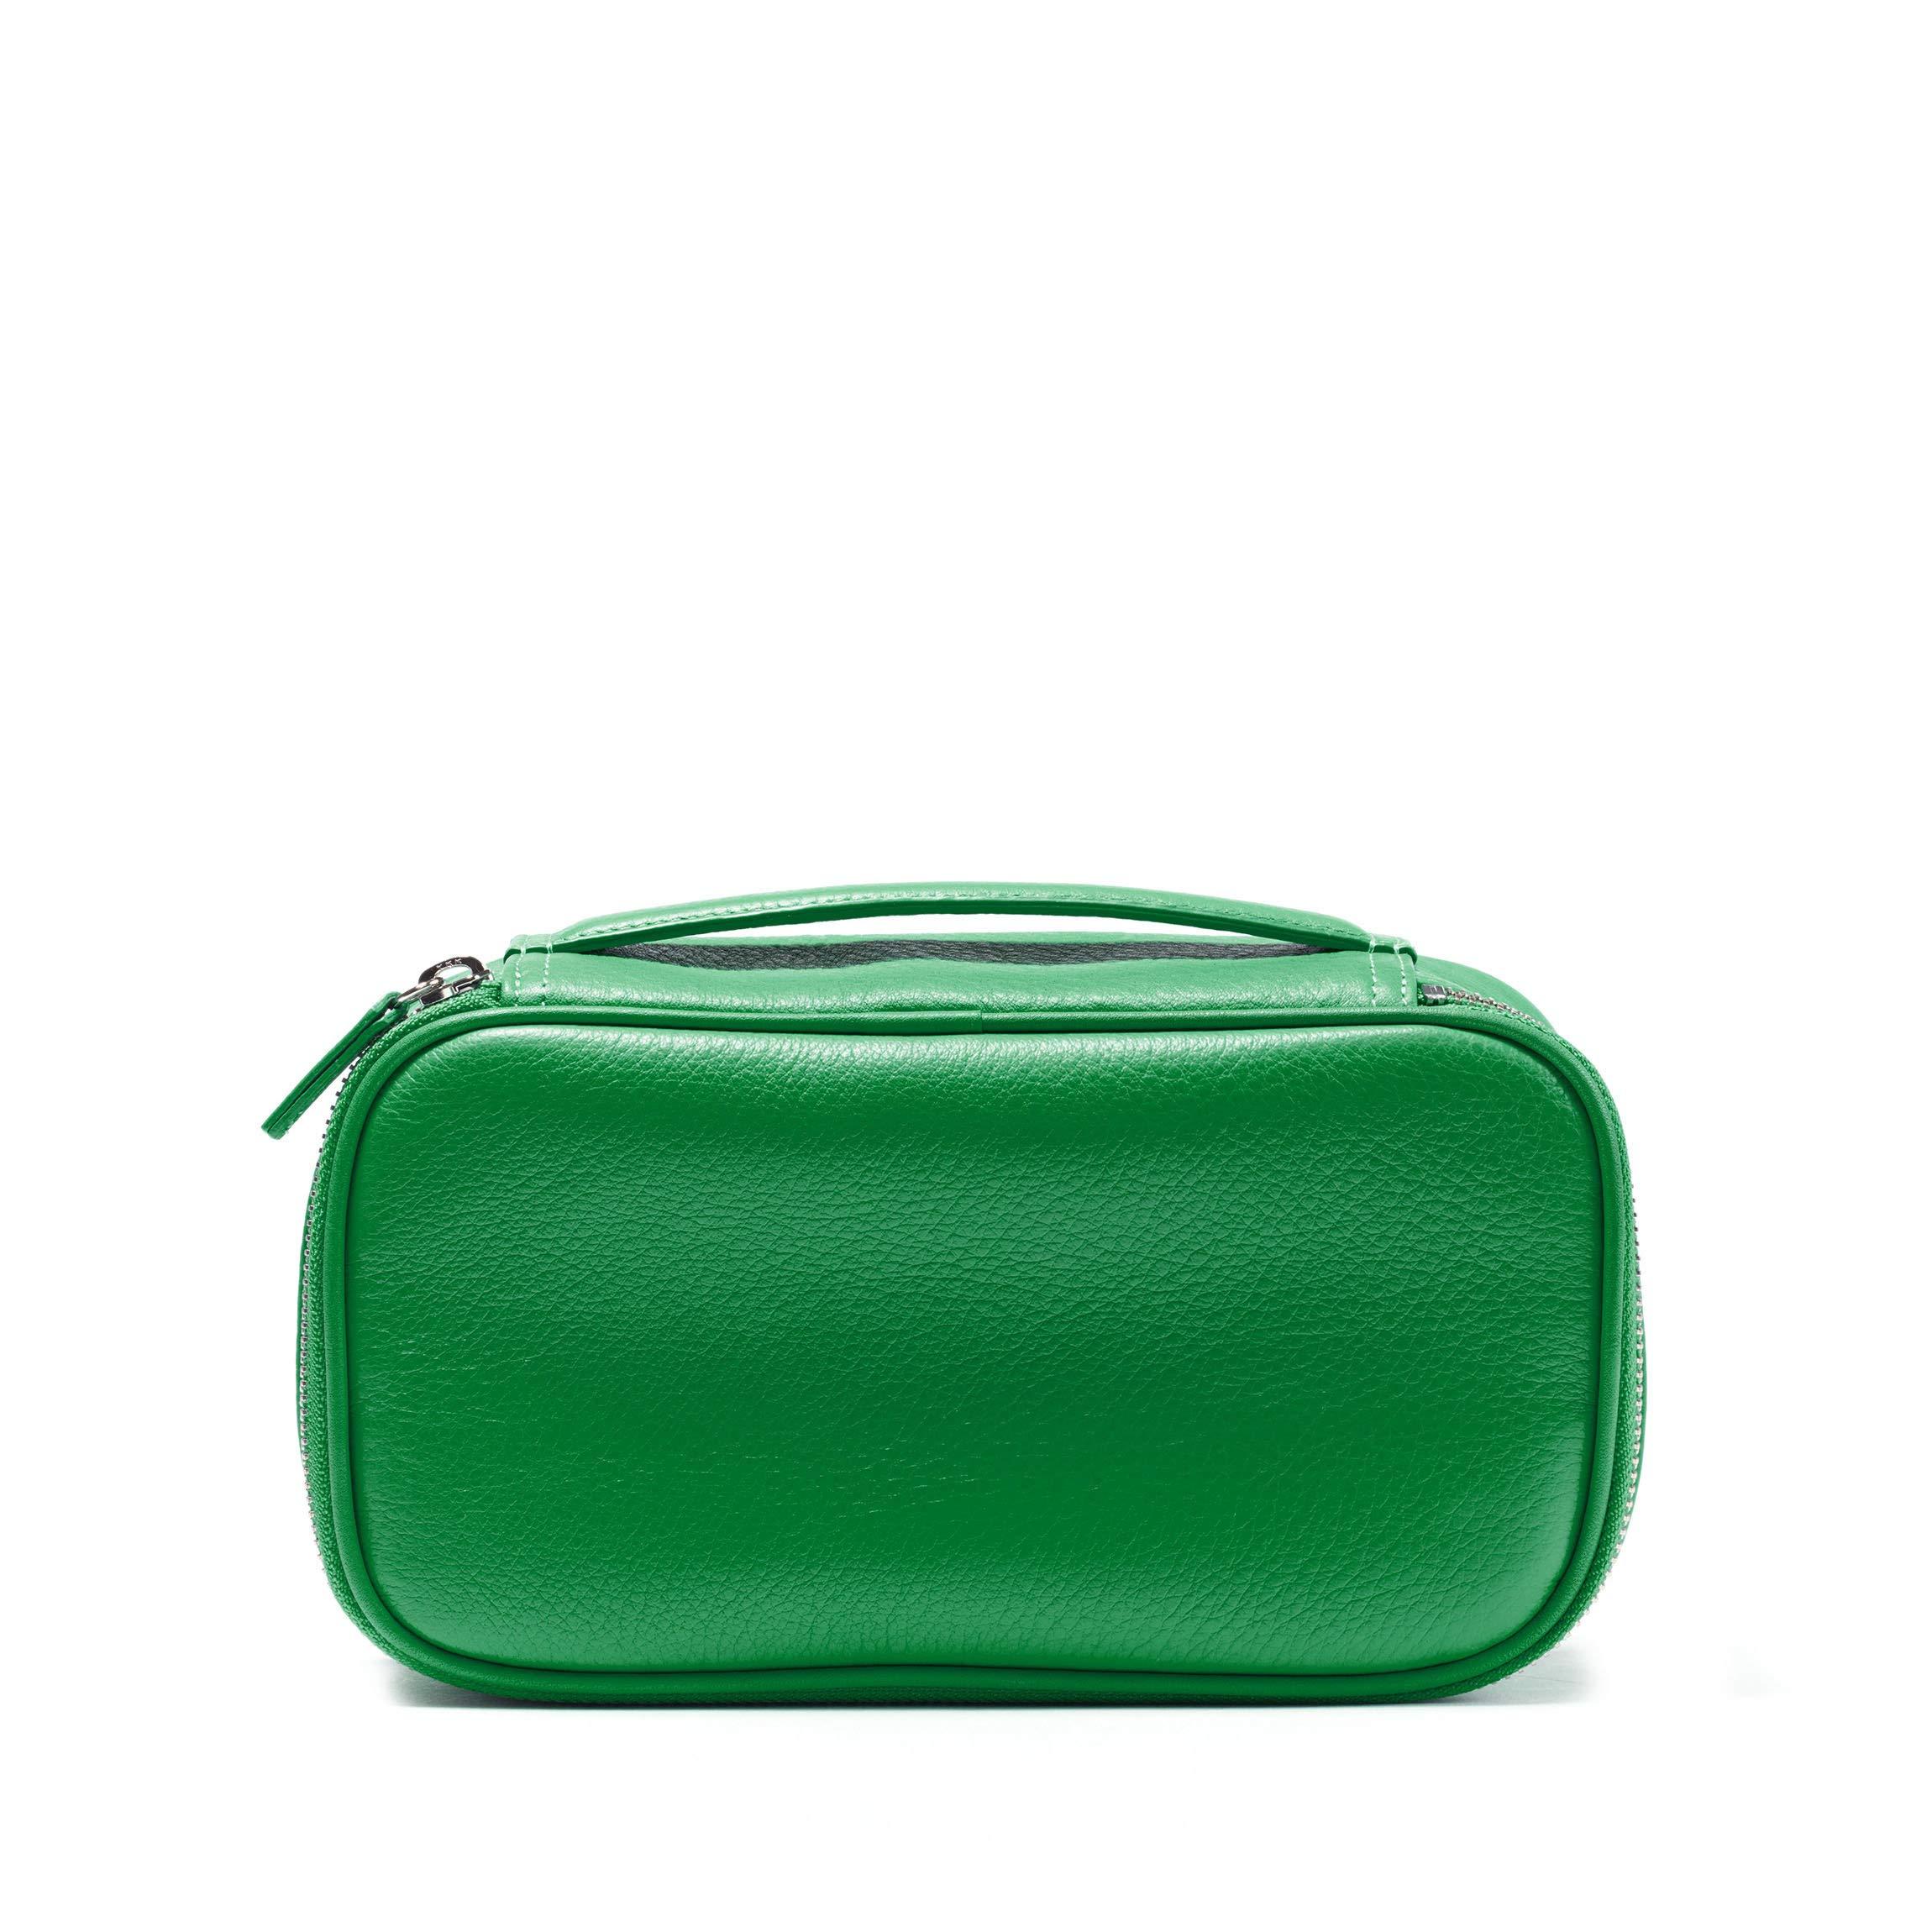 Leatherology Medium Travel Organizer - Full Grain Leather Leather - Kelly Green (green)